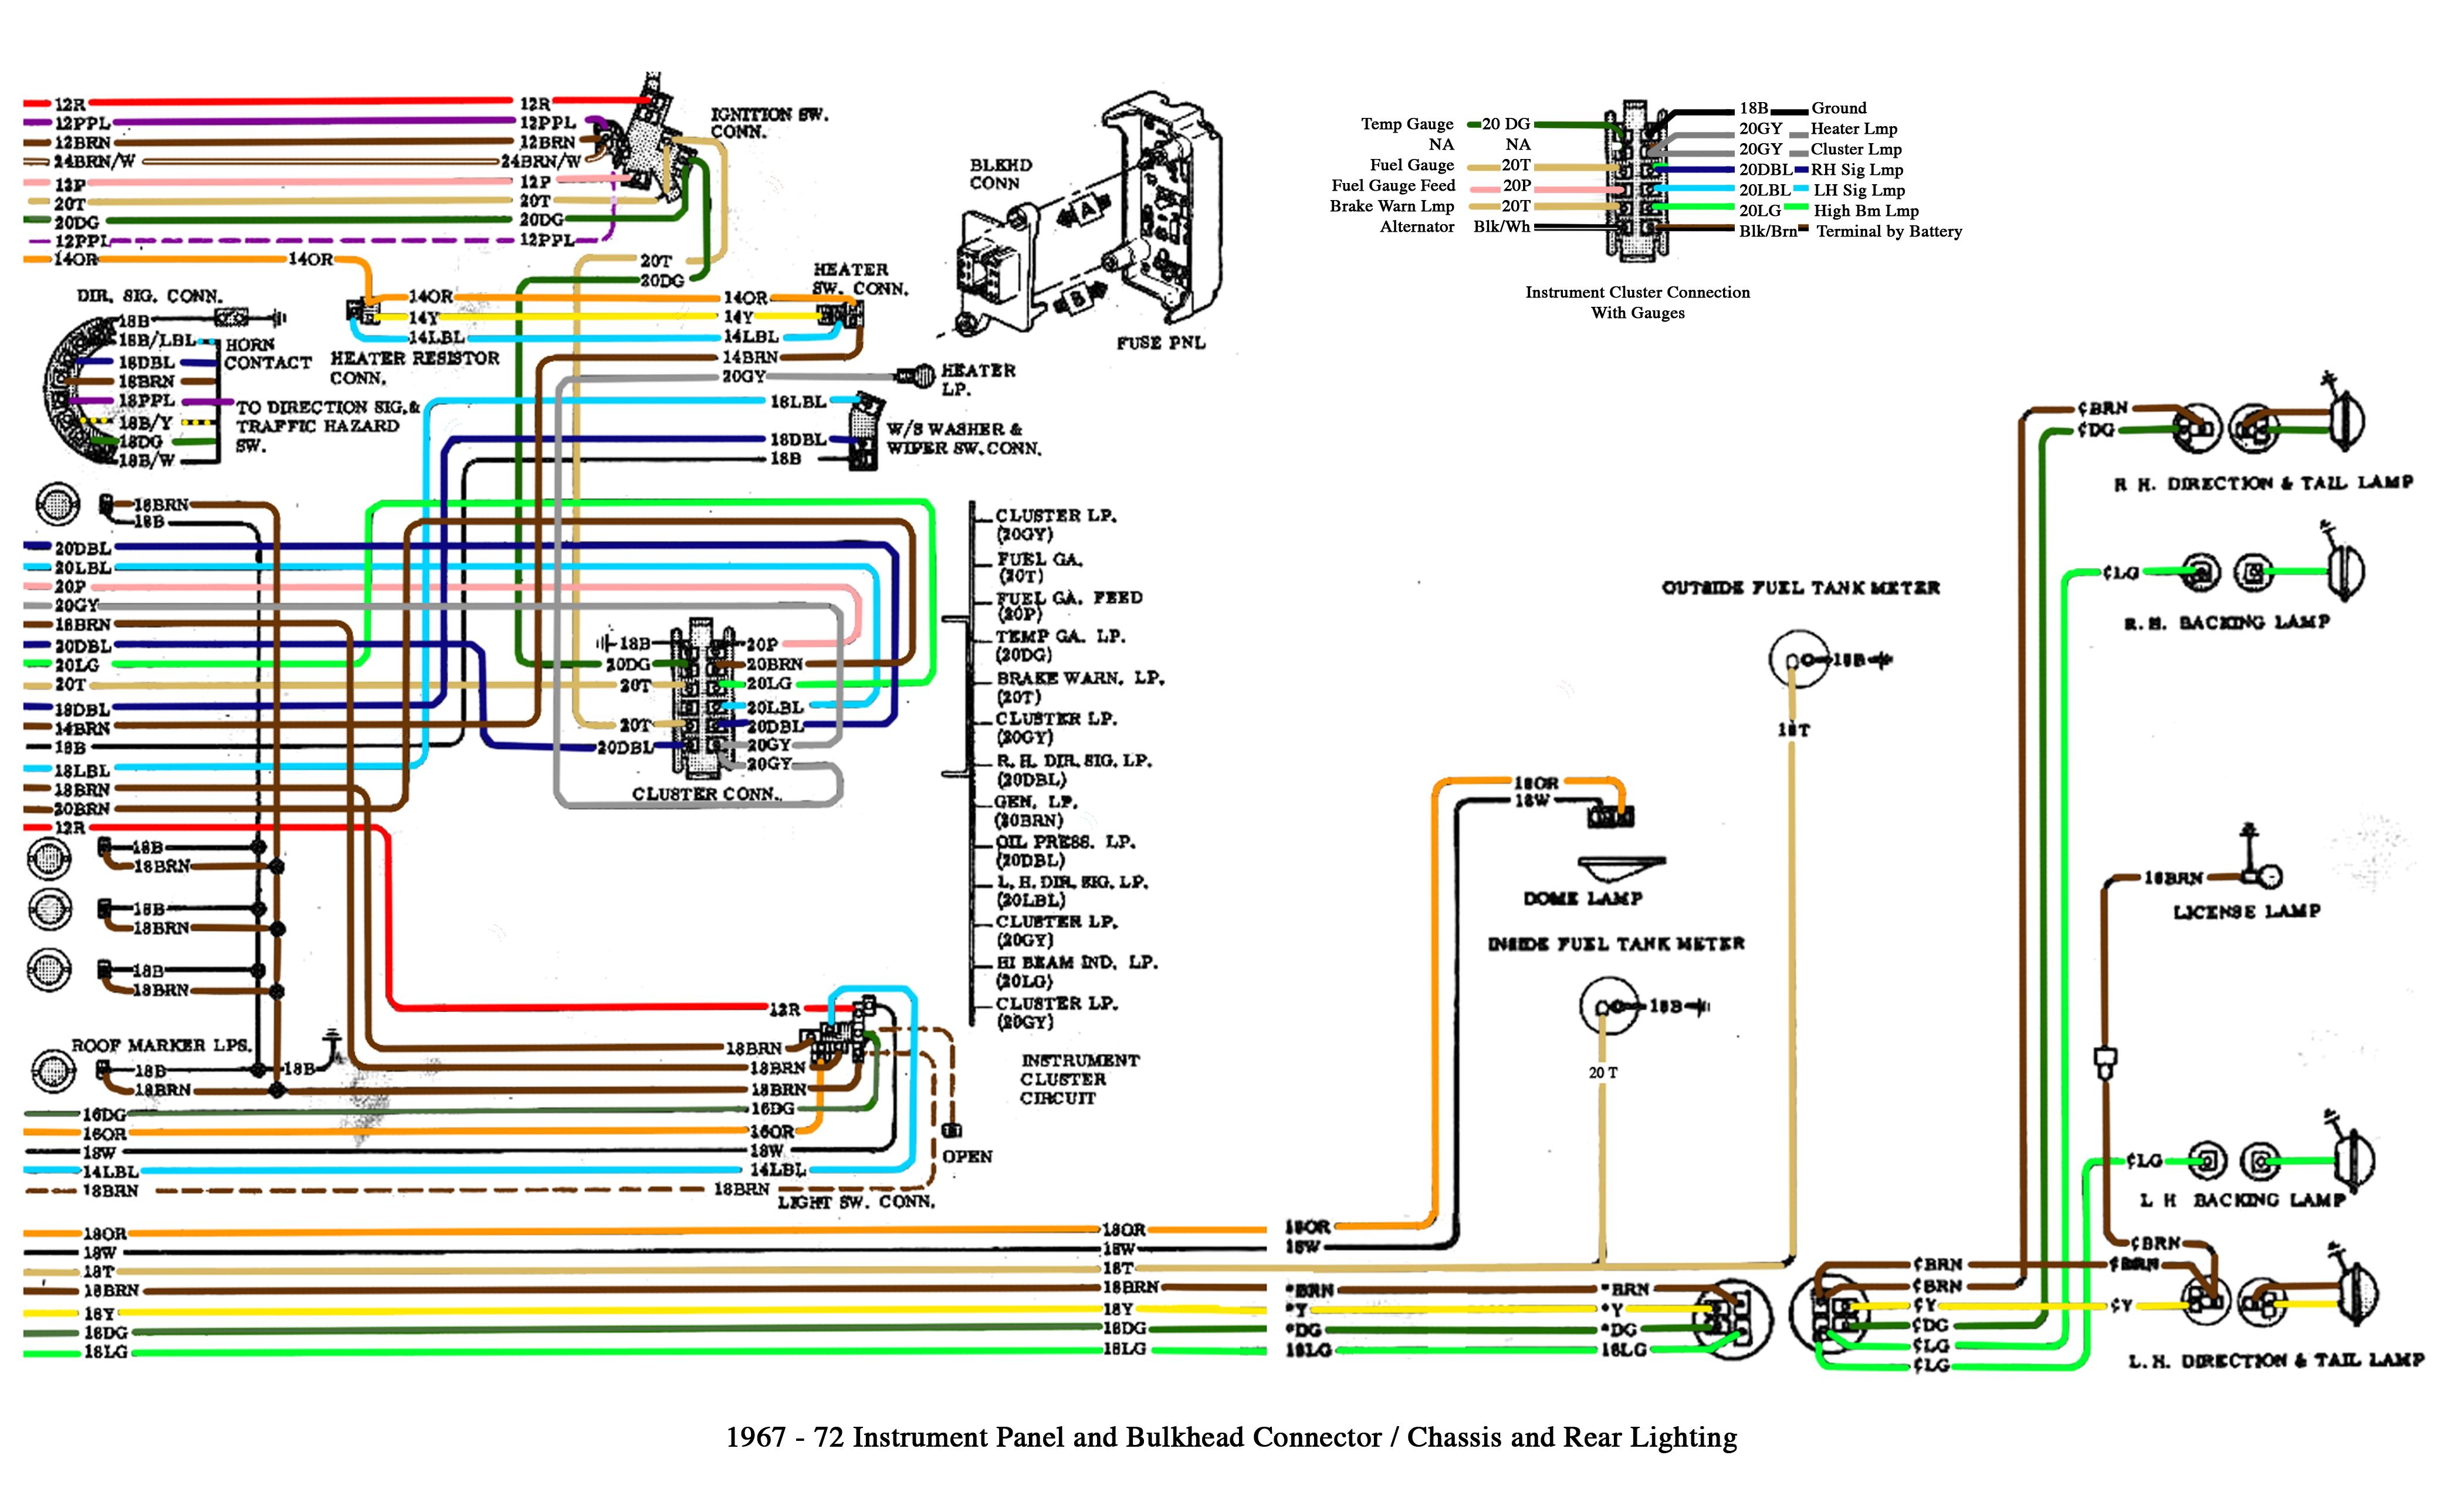 Chevy Truck Fuse Diagram | Manual E-Books - 1990 Chevy 1500 Fuel Pump Wiring Diagram